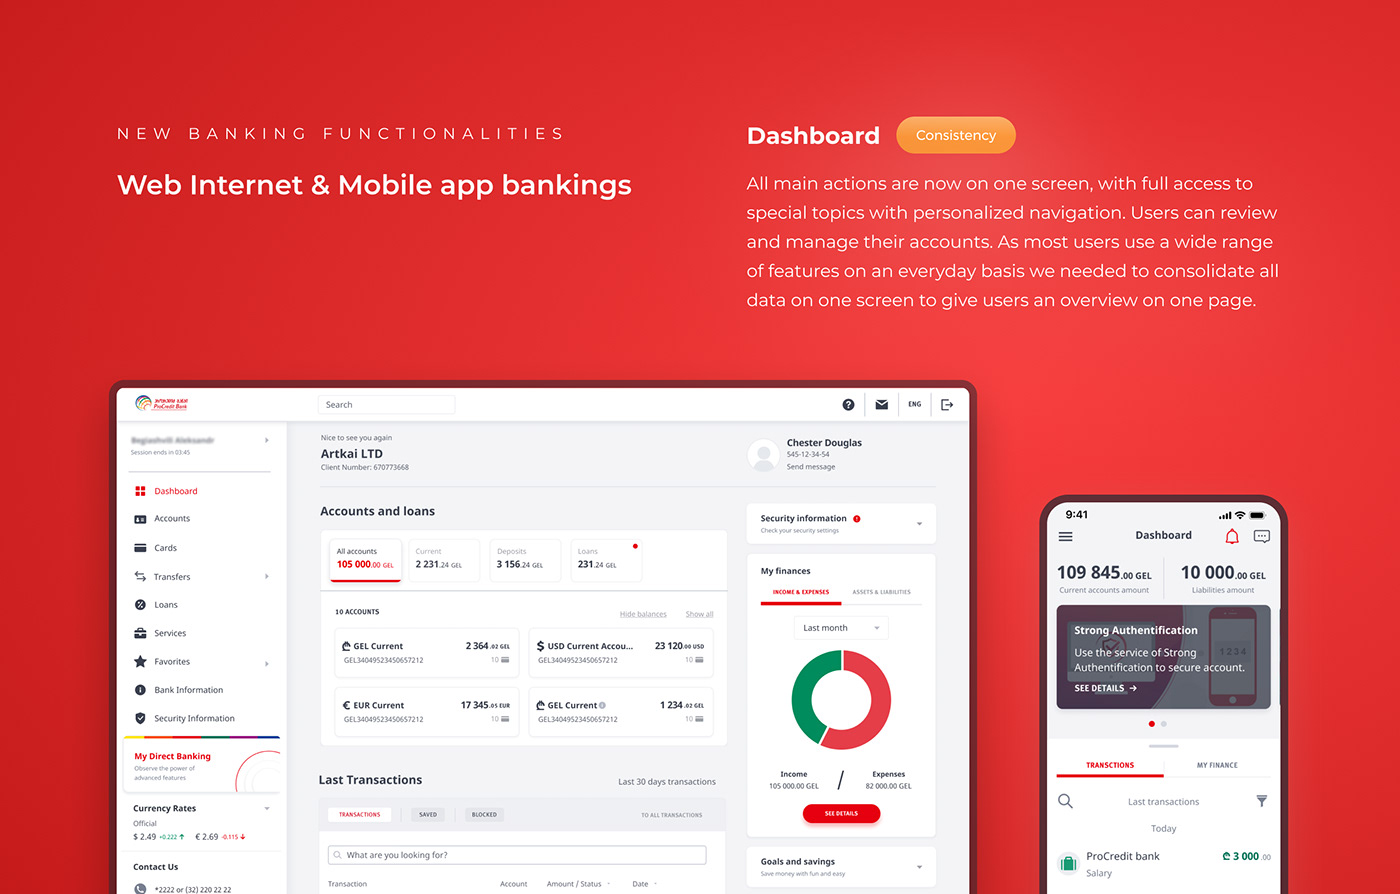 artkai bank ux banking BFSI Fintech Internet Banking mobile banking neobank online banking UX for bank